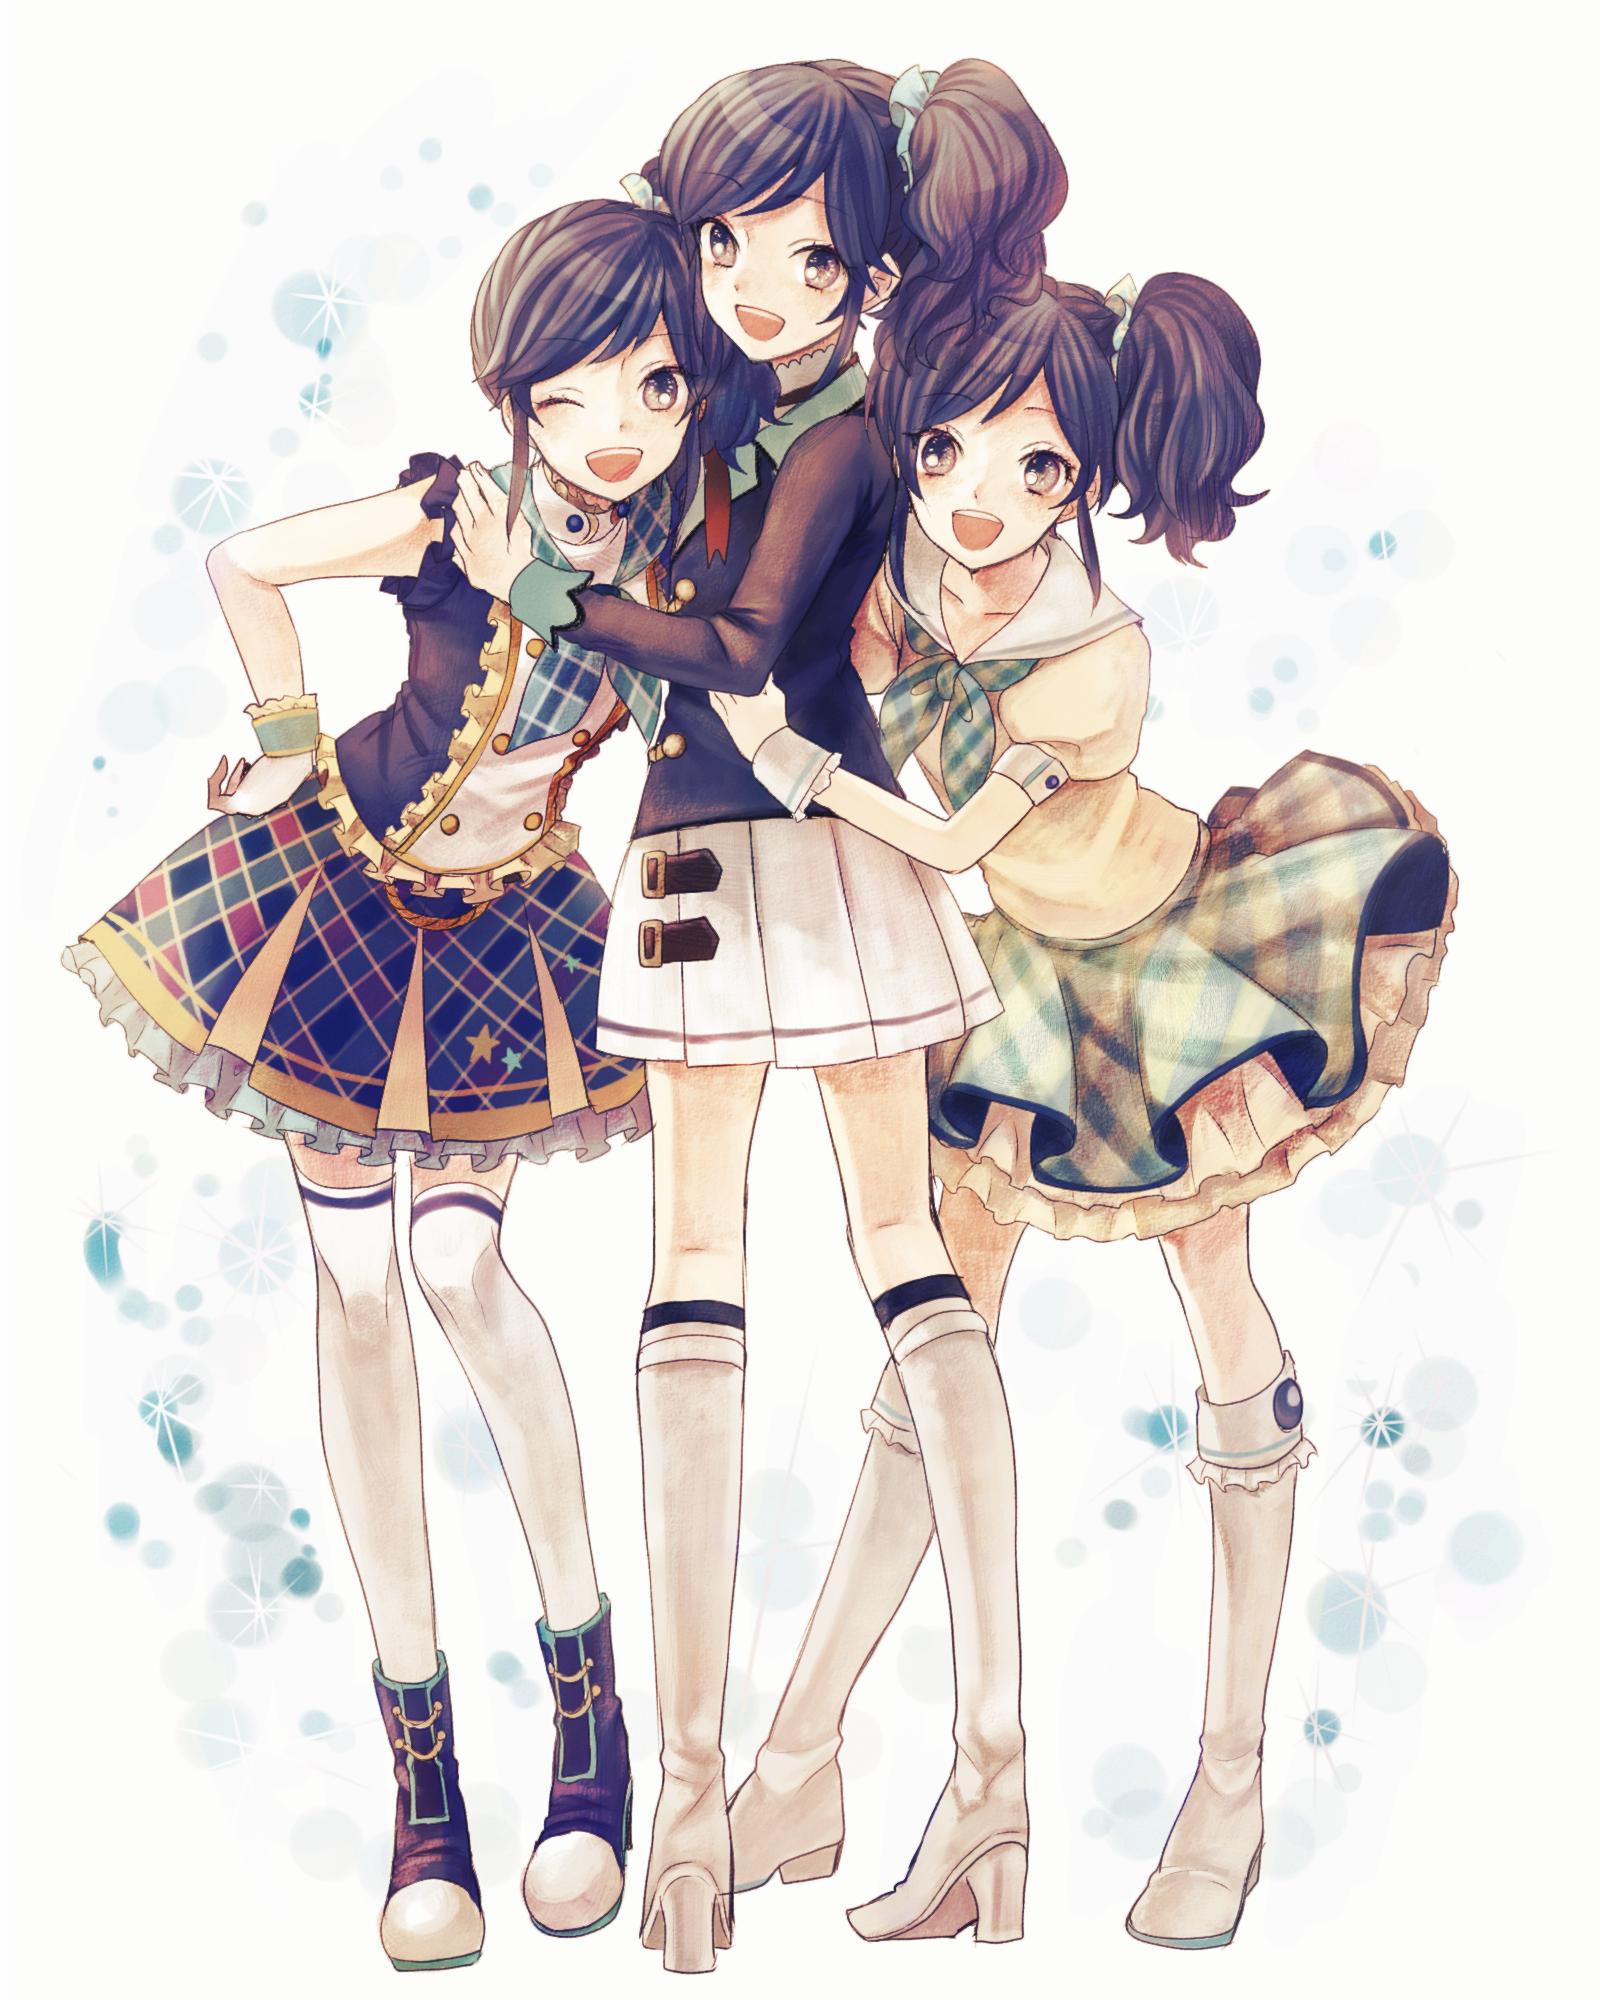 The three secret sisters